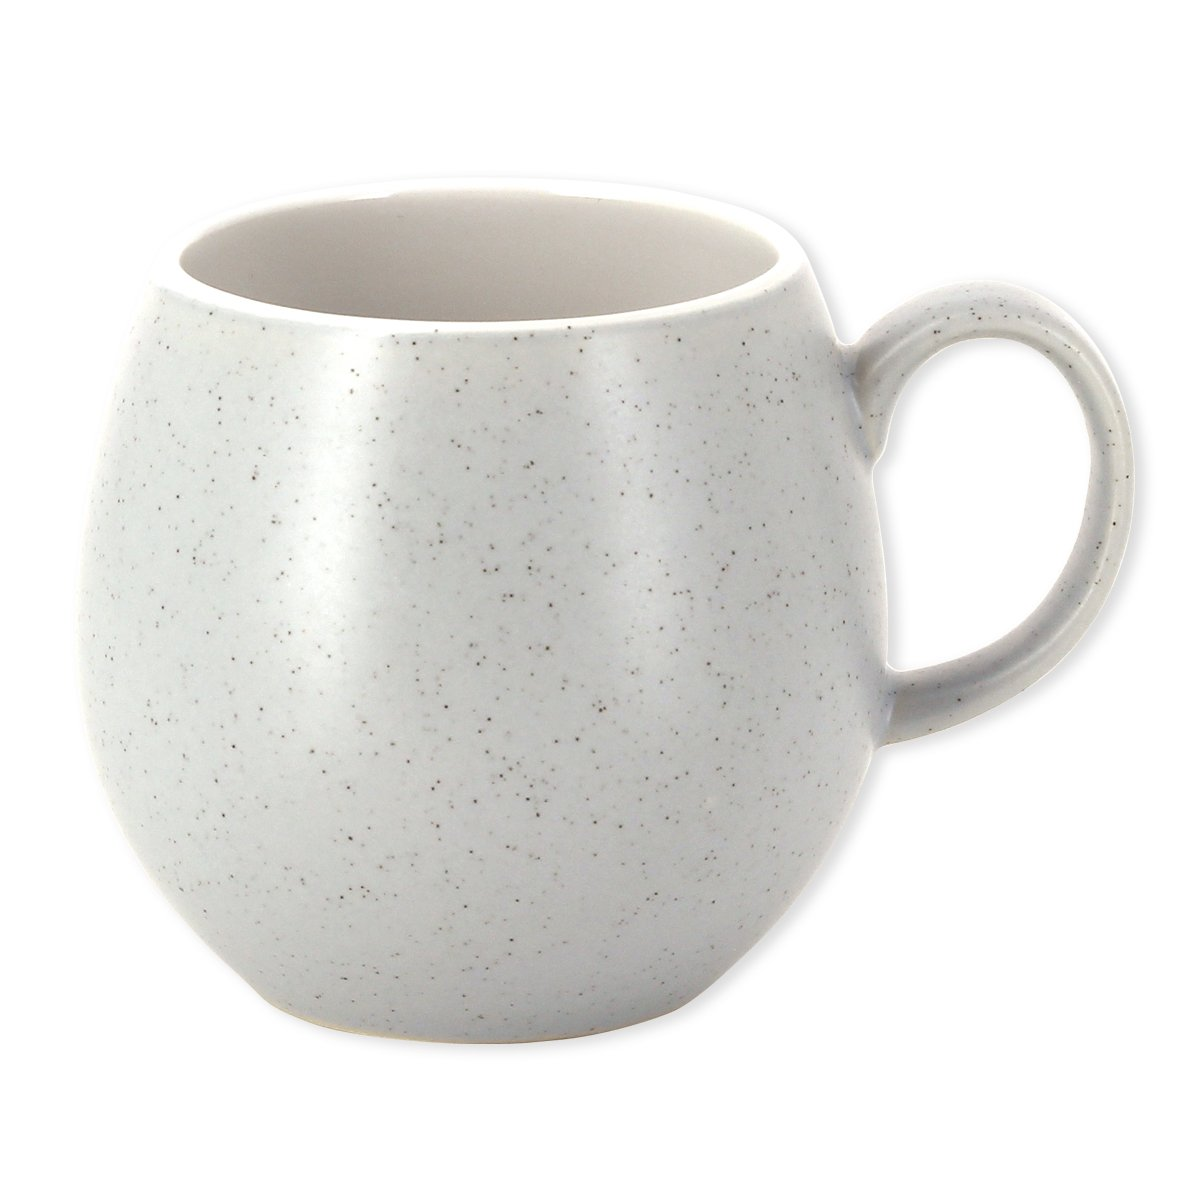 London Pottery Pebble Mug Matt Light Blue